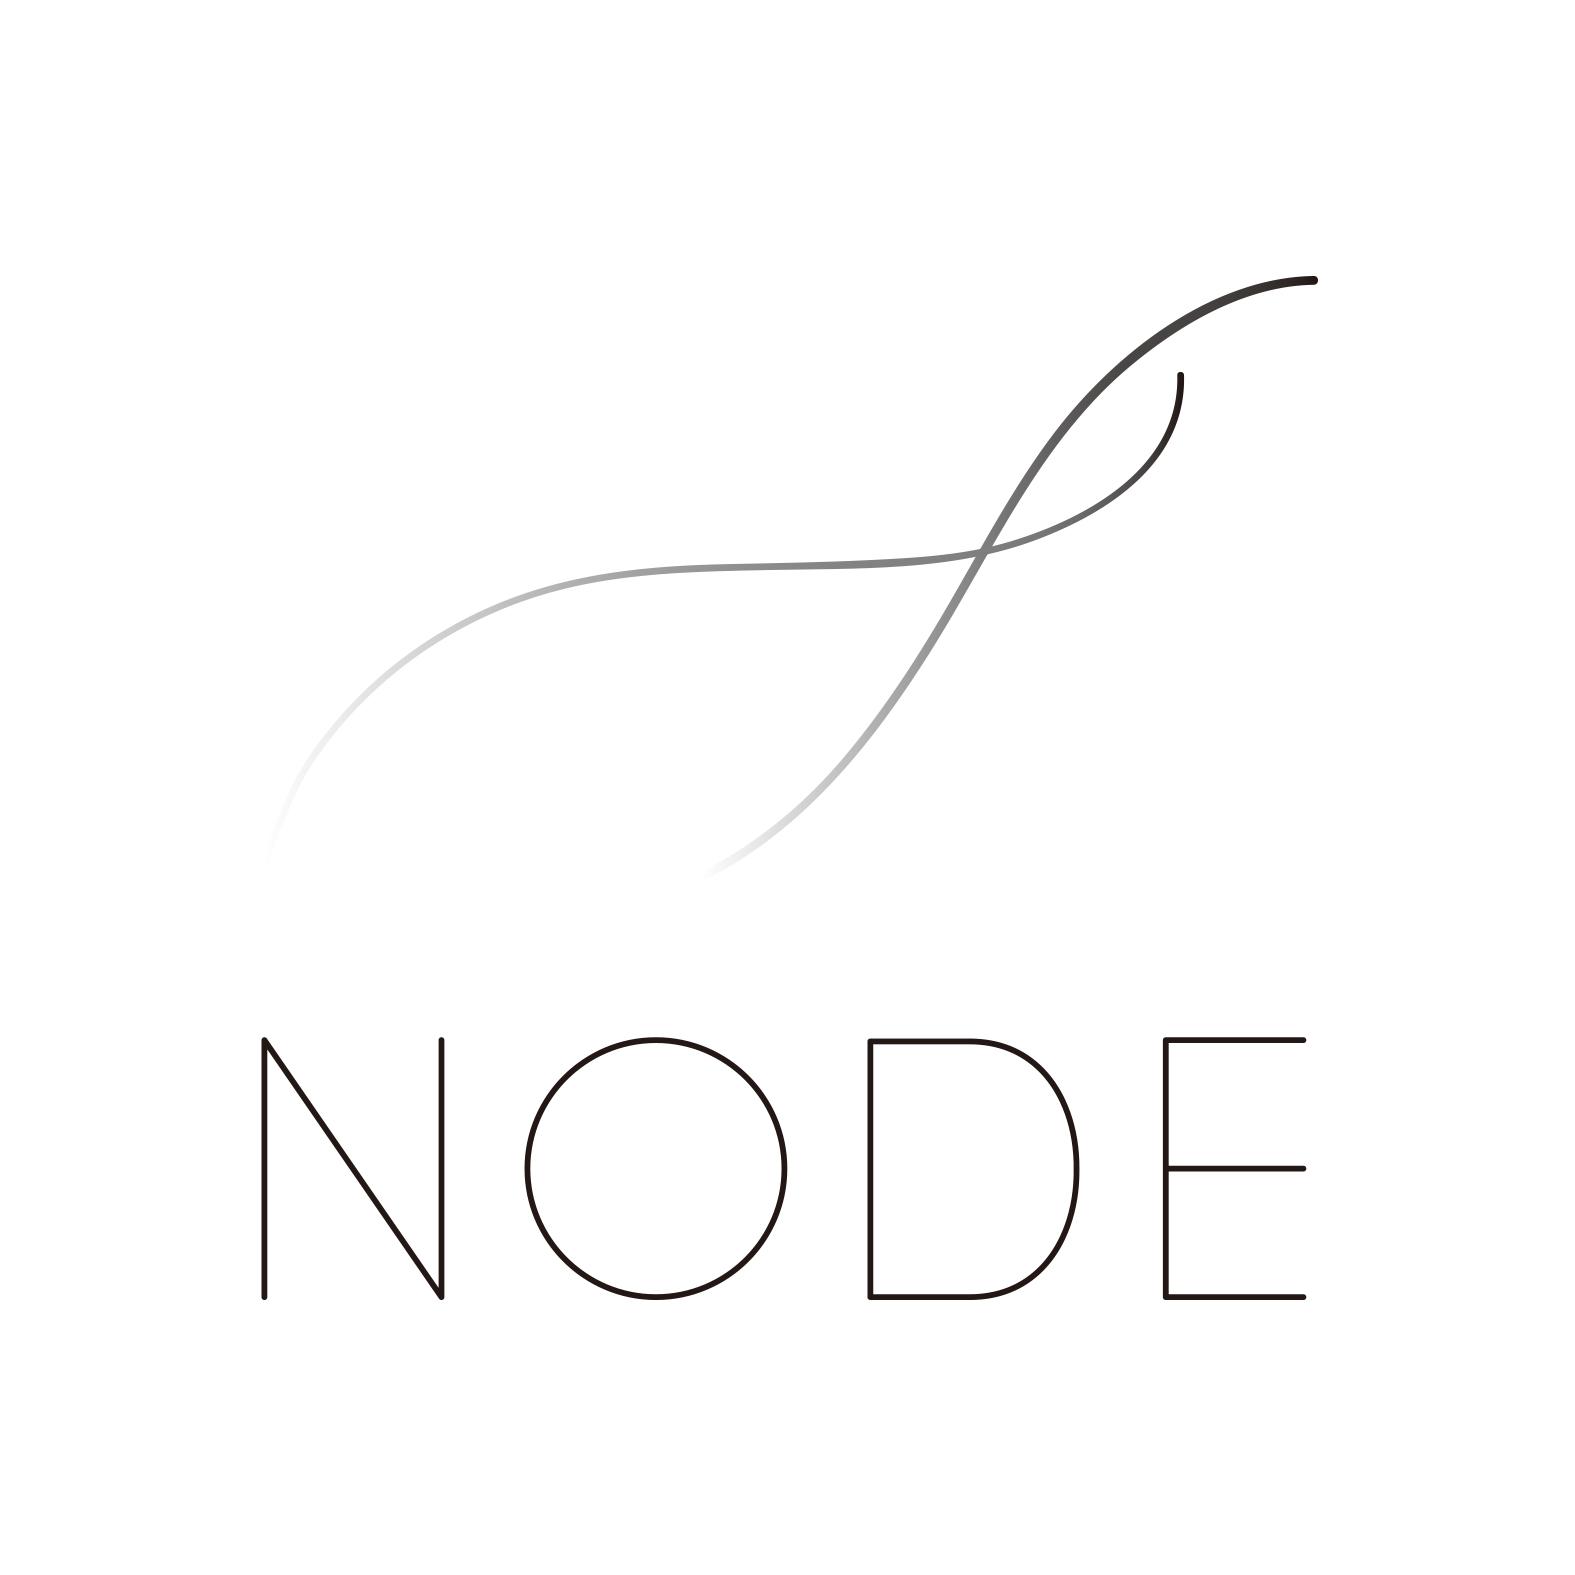 NODE株式会社